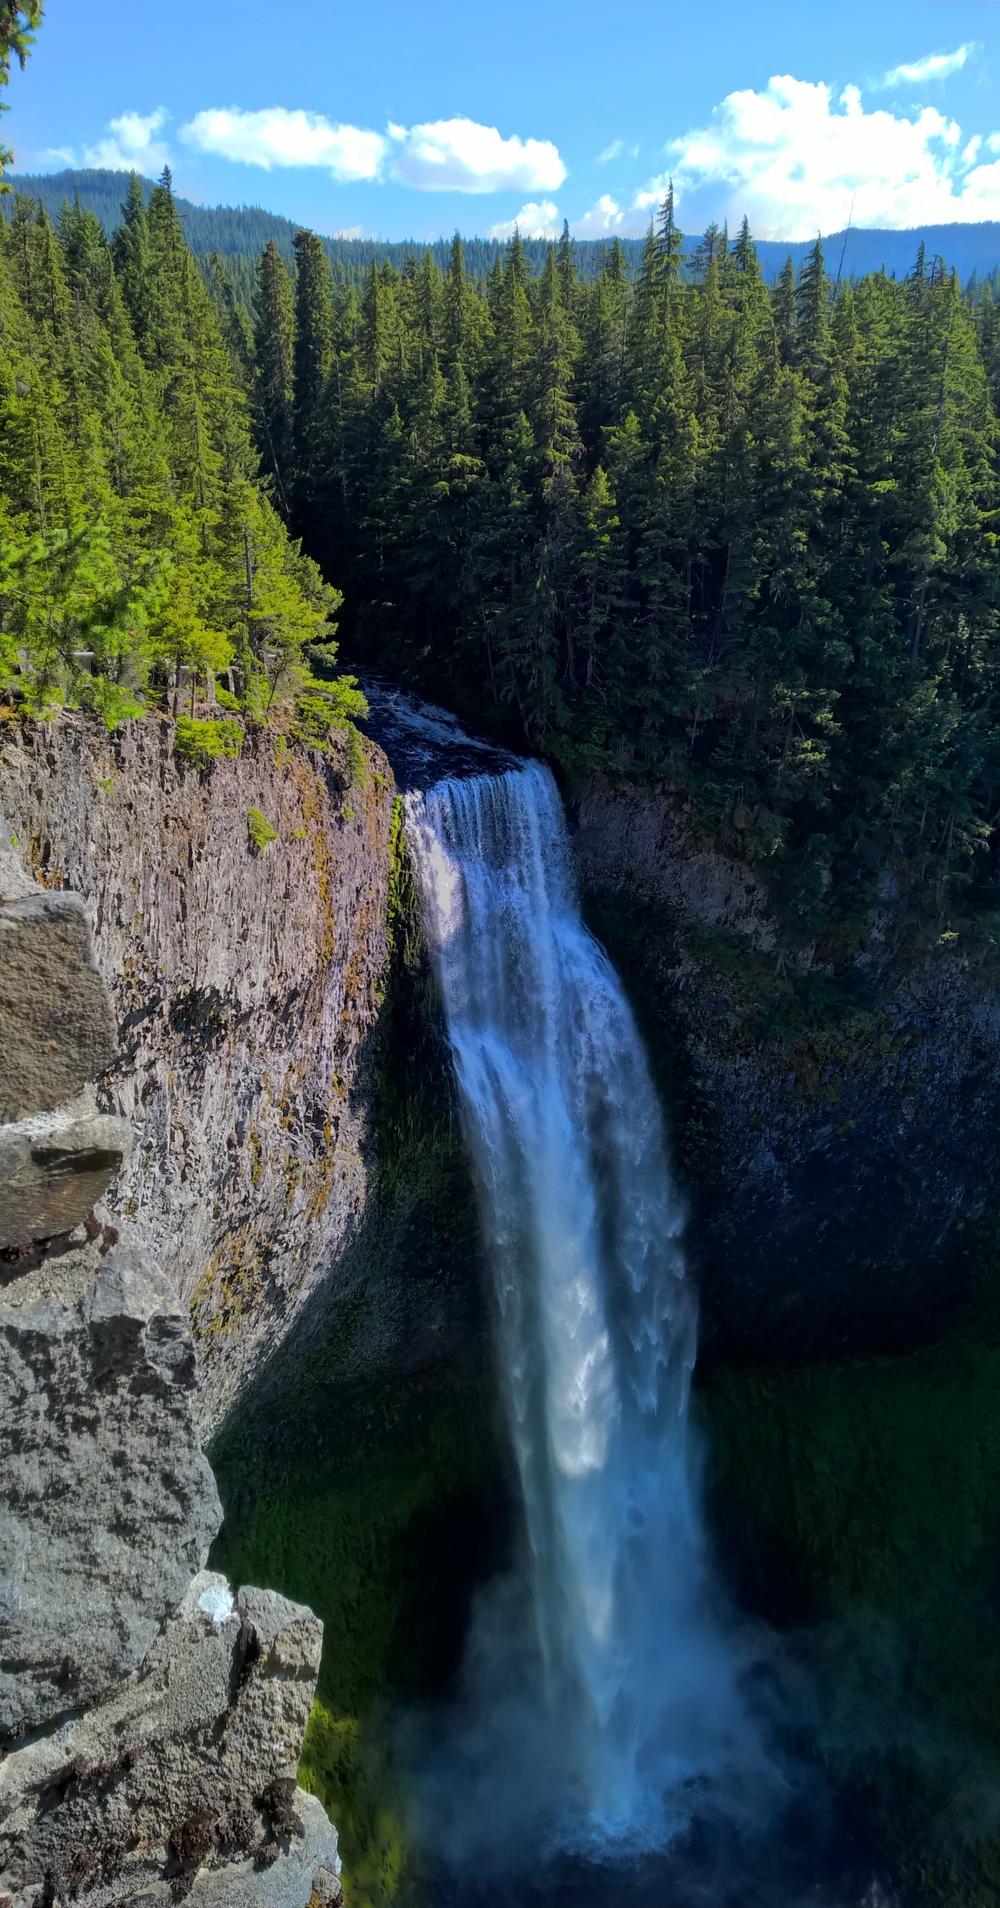 Salt Creek Falls - Willamette National Forest, OR